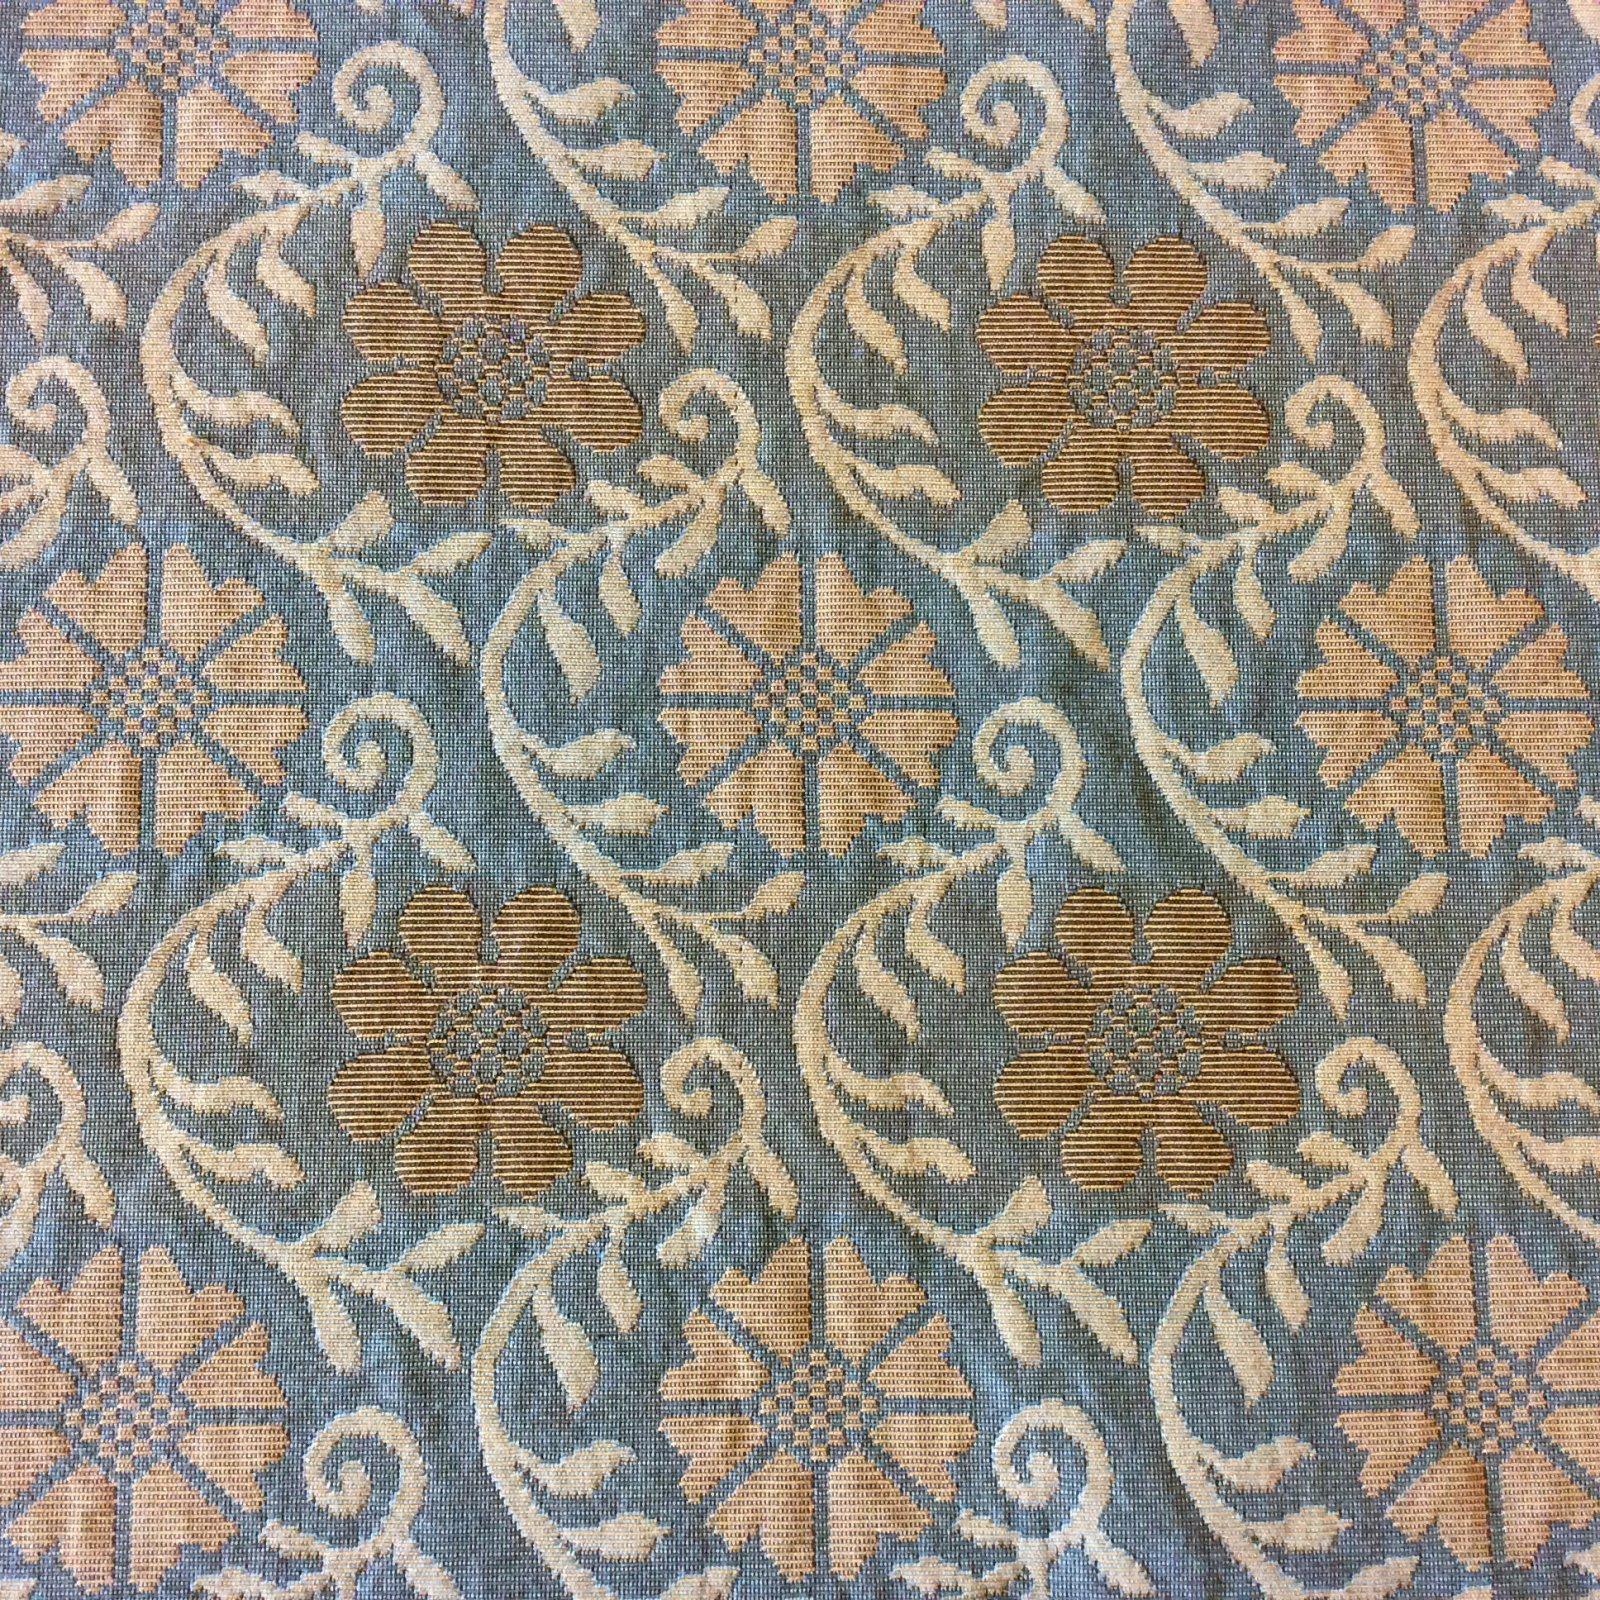 471FG Ashley Floral Ivy Flower Geo Geometric Heavy Upholstery Home Dec Fabric